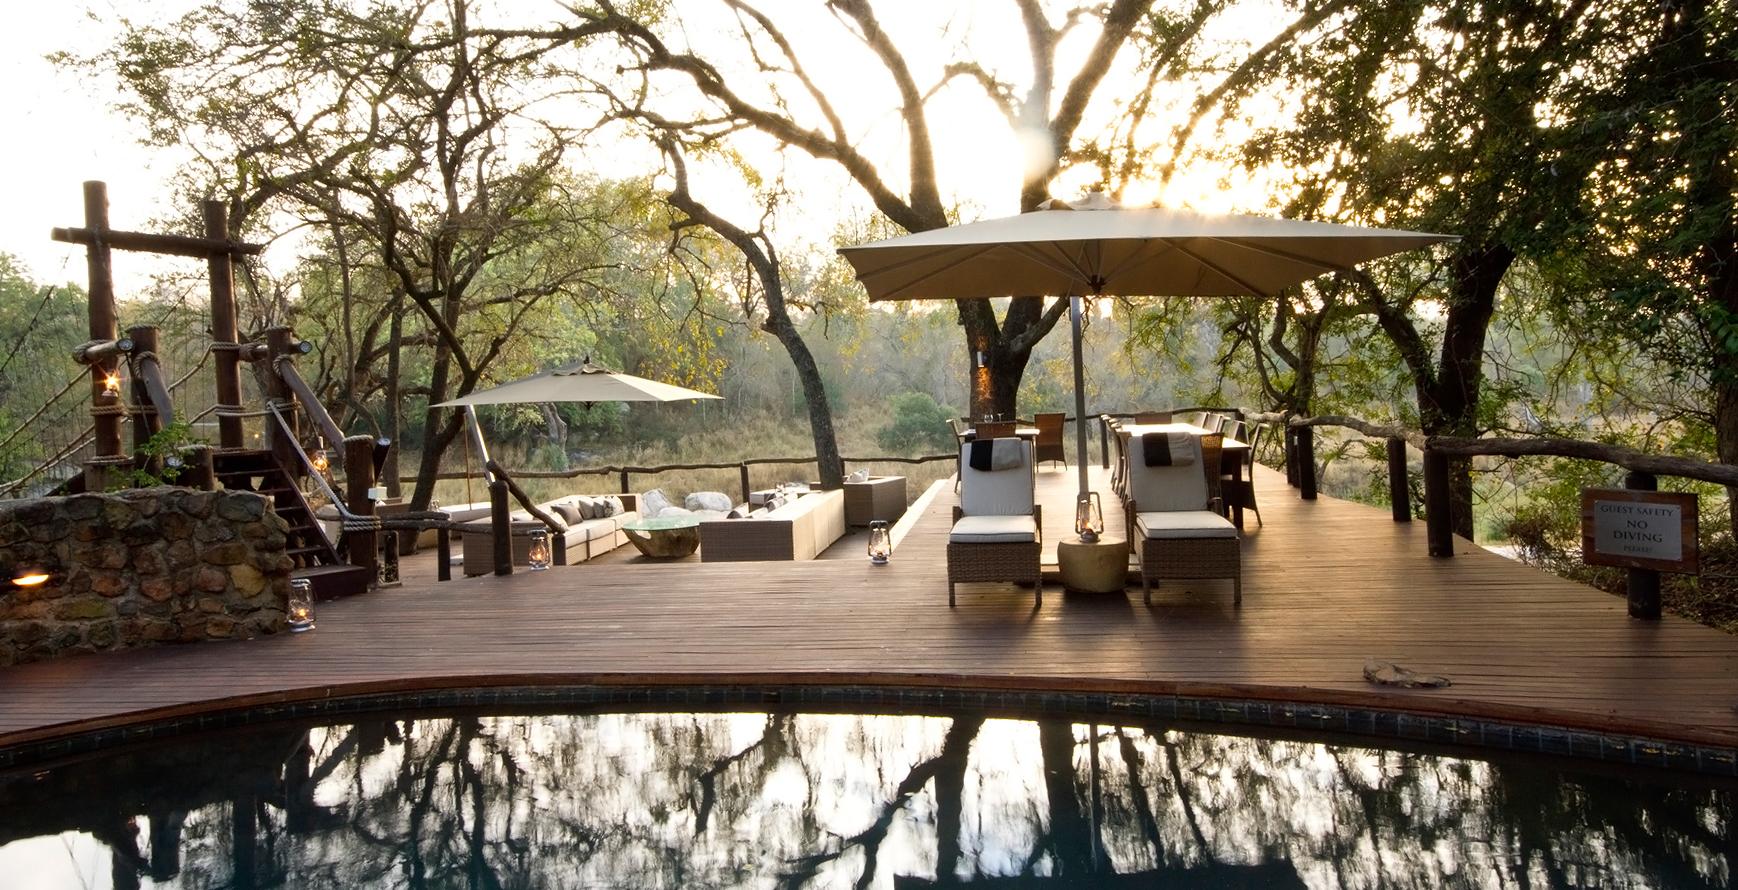 South-Africa-Dulini-Lodge-Deck-Pool